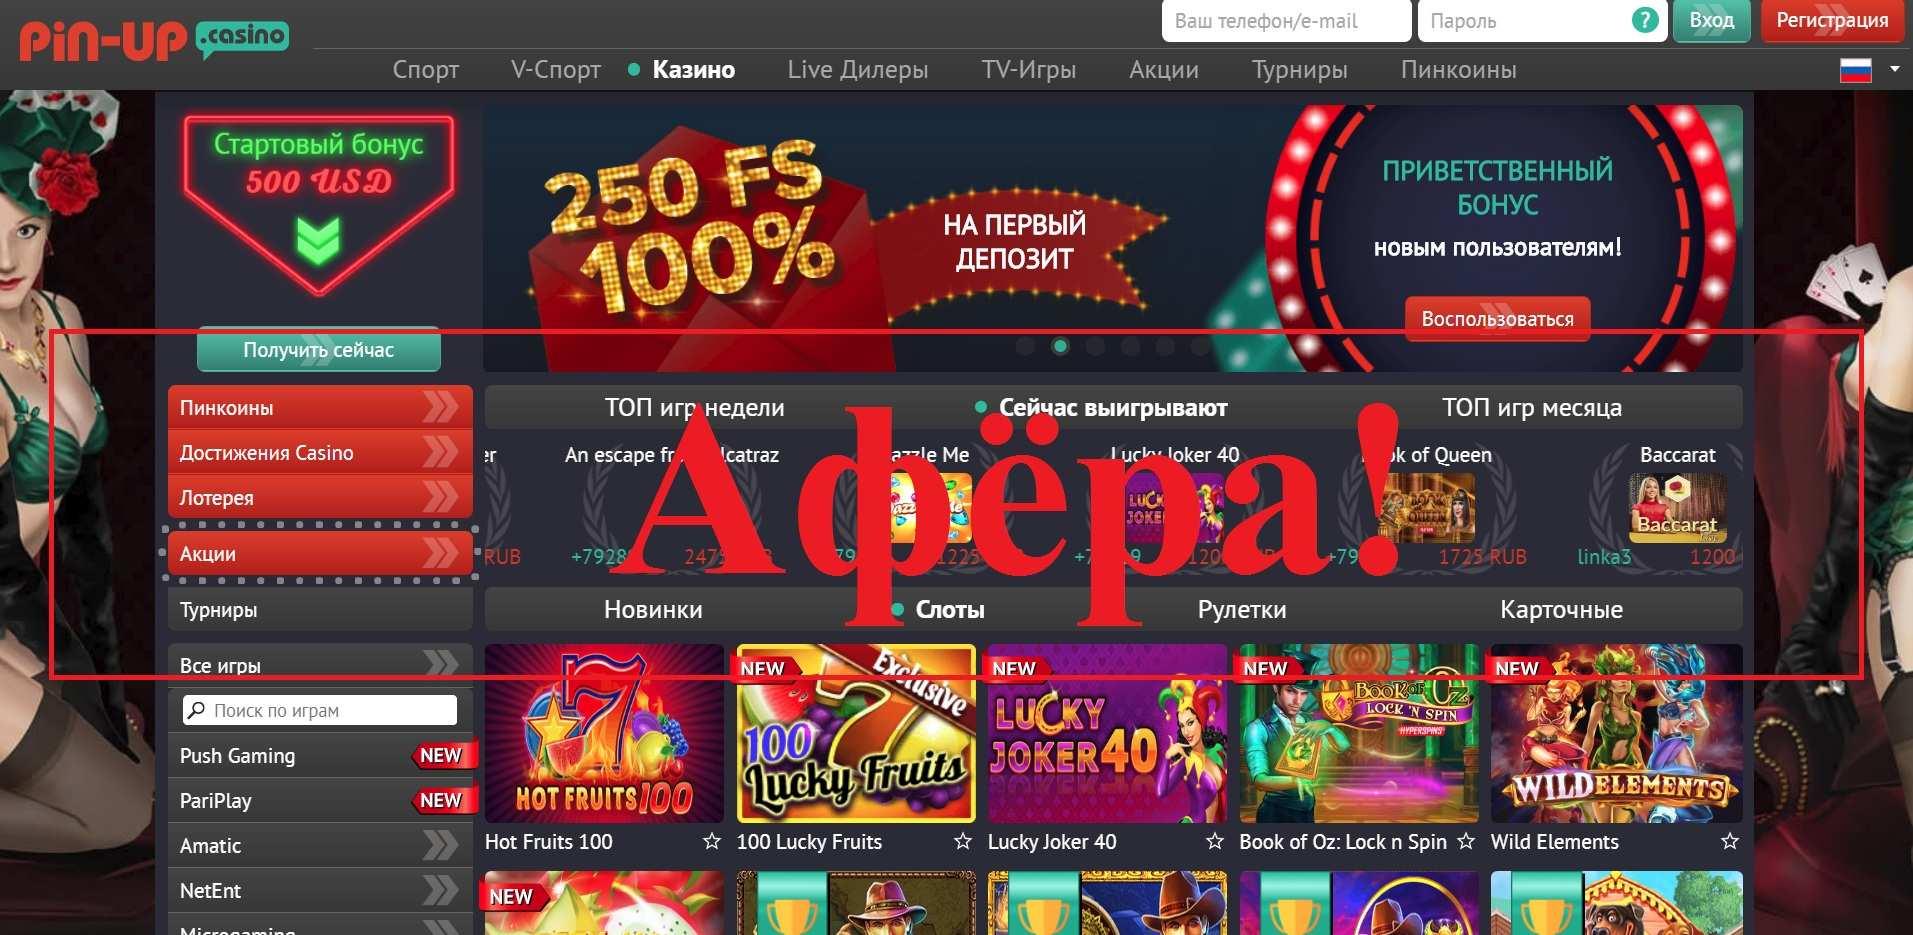 Pin Up казино – отзывы и обзор pin-up.casino